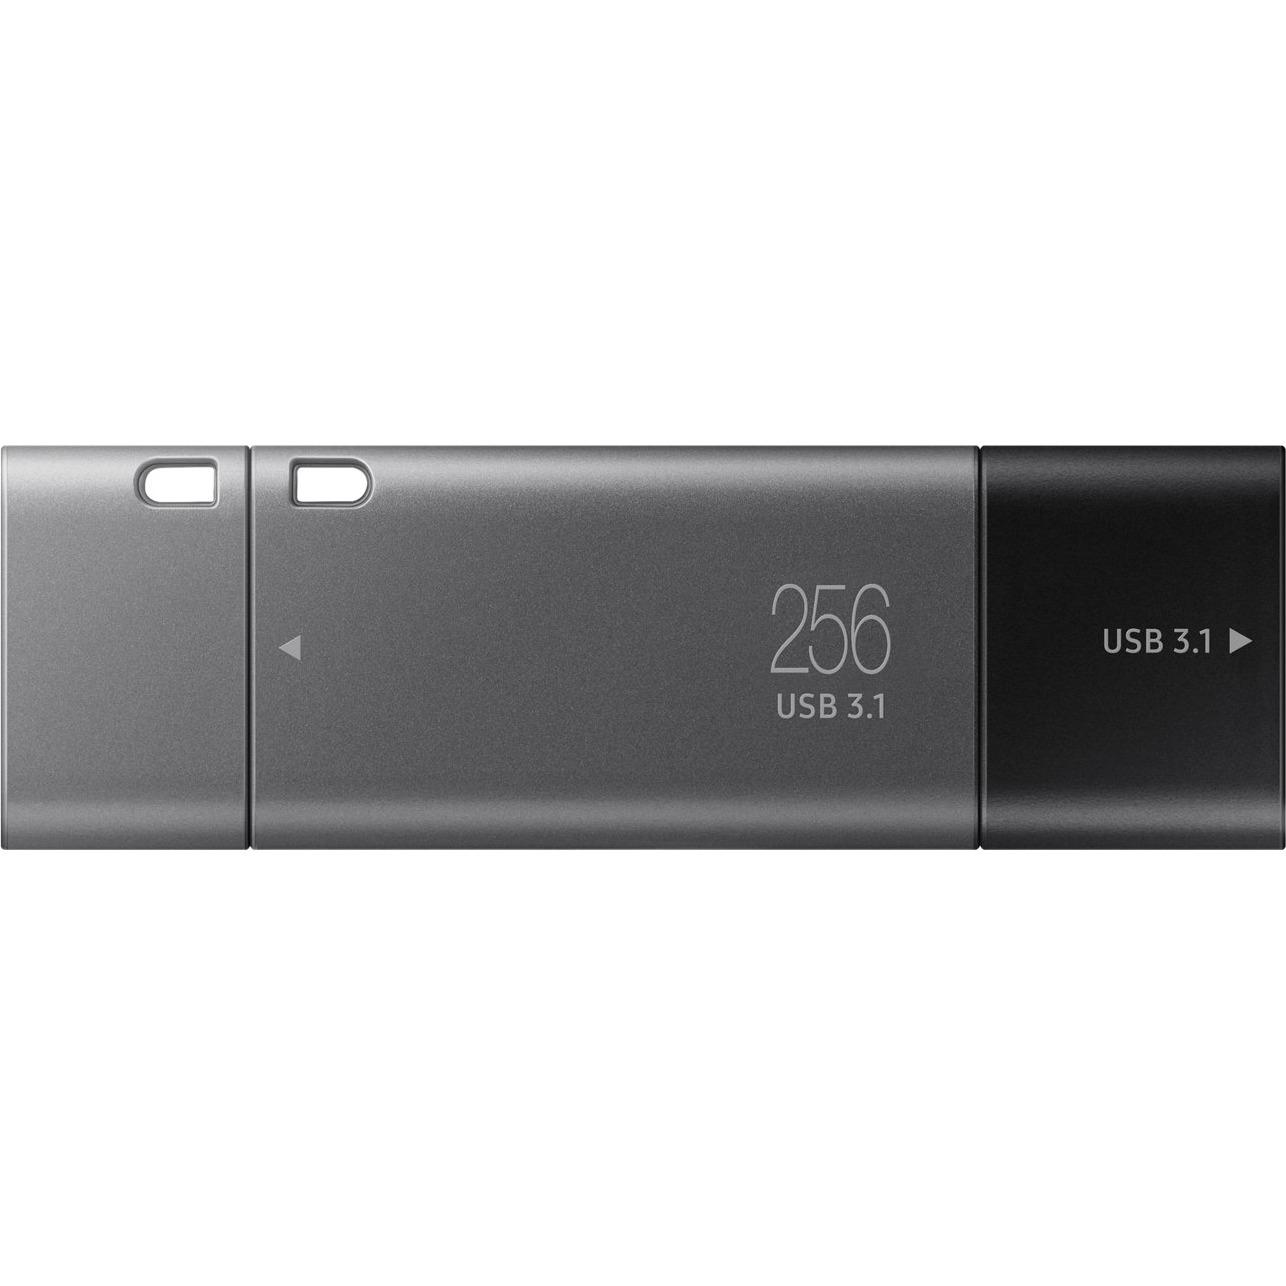 Samsung Duo Plus 256 GB USB 3.1 Type C, USB 3.1 Type A Flash Drive